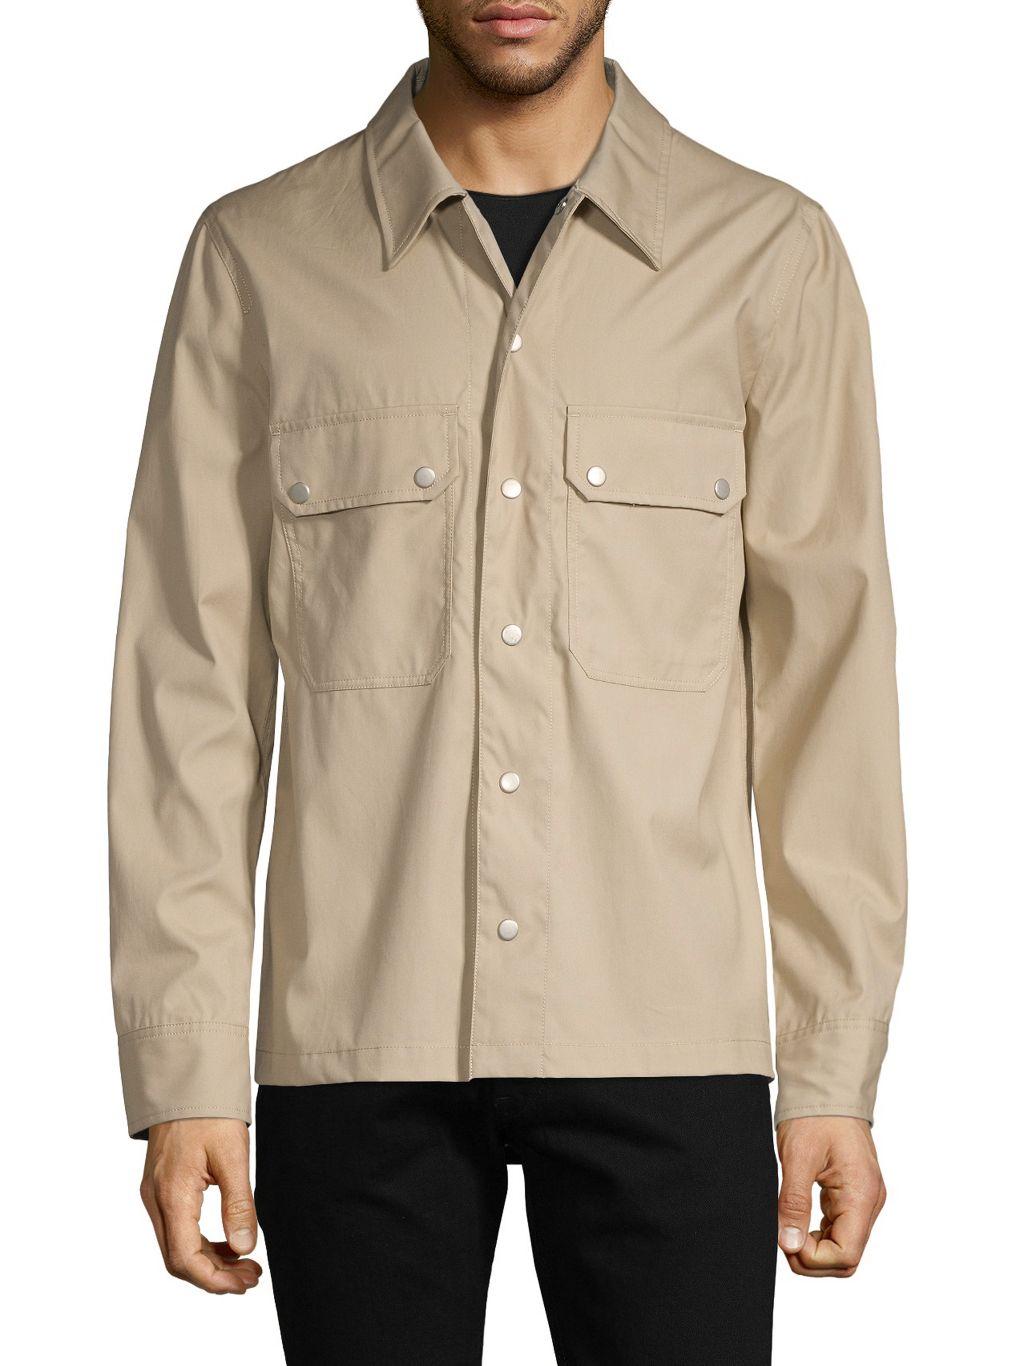 Helmut Lang Snap Cotton Shirt Jacket